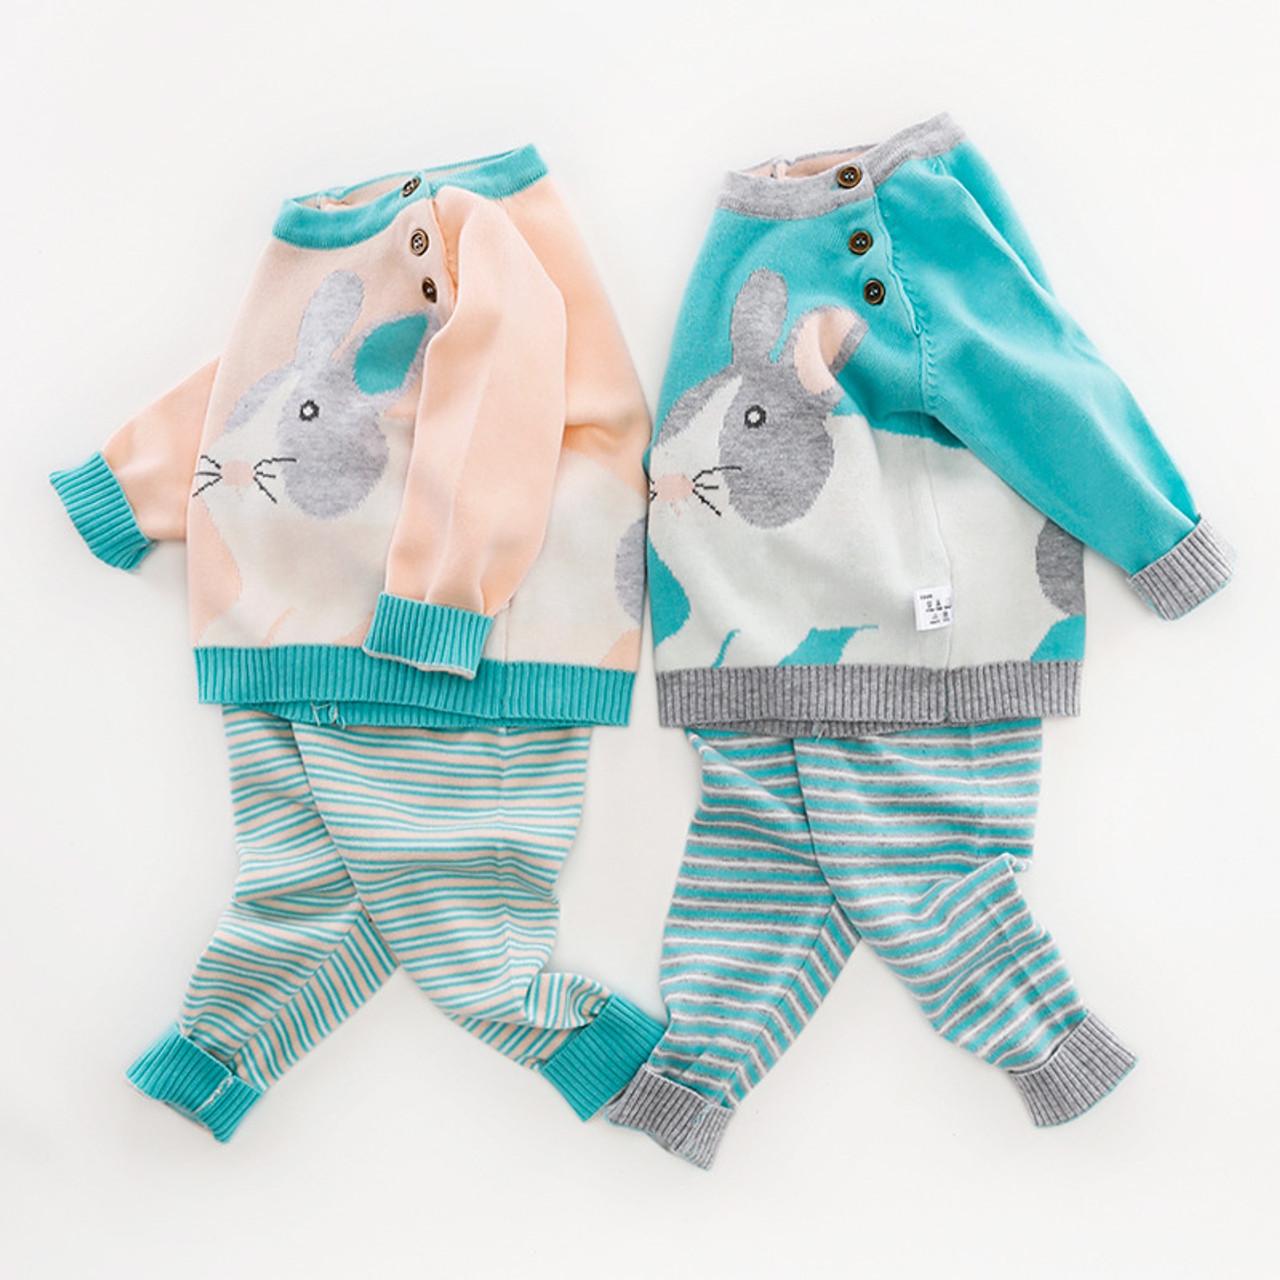 d6688c548 2Pcs Baby Cardigan Kids Sweaters Set Tiny Cotton Knit Sweters Sets ...